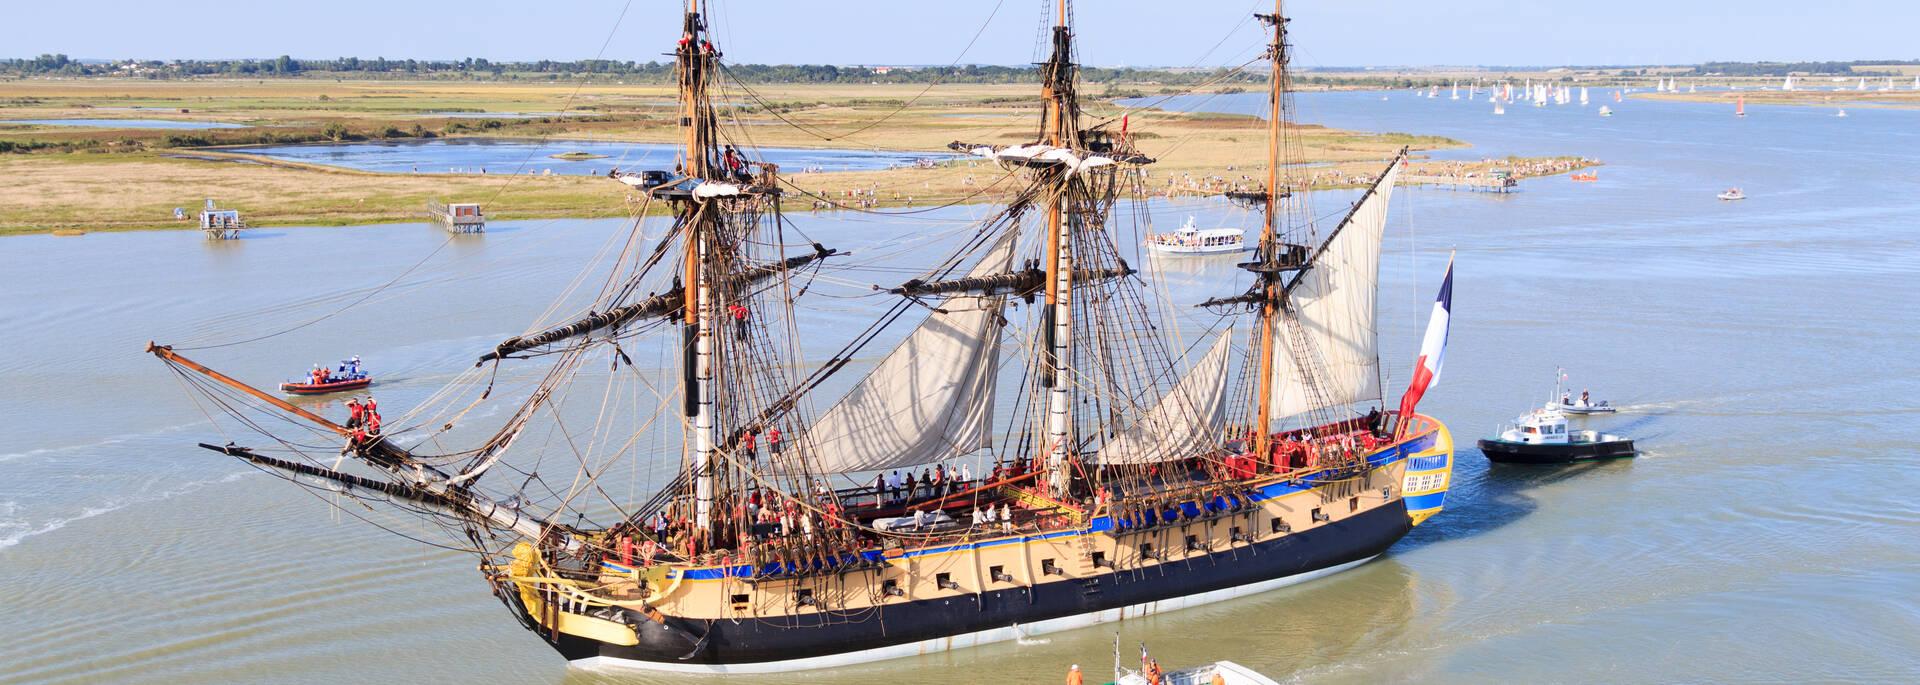 The frigate Hermione on the Charente river - © David Compain - Ville de Rochefort